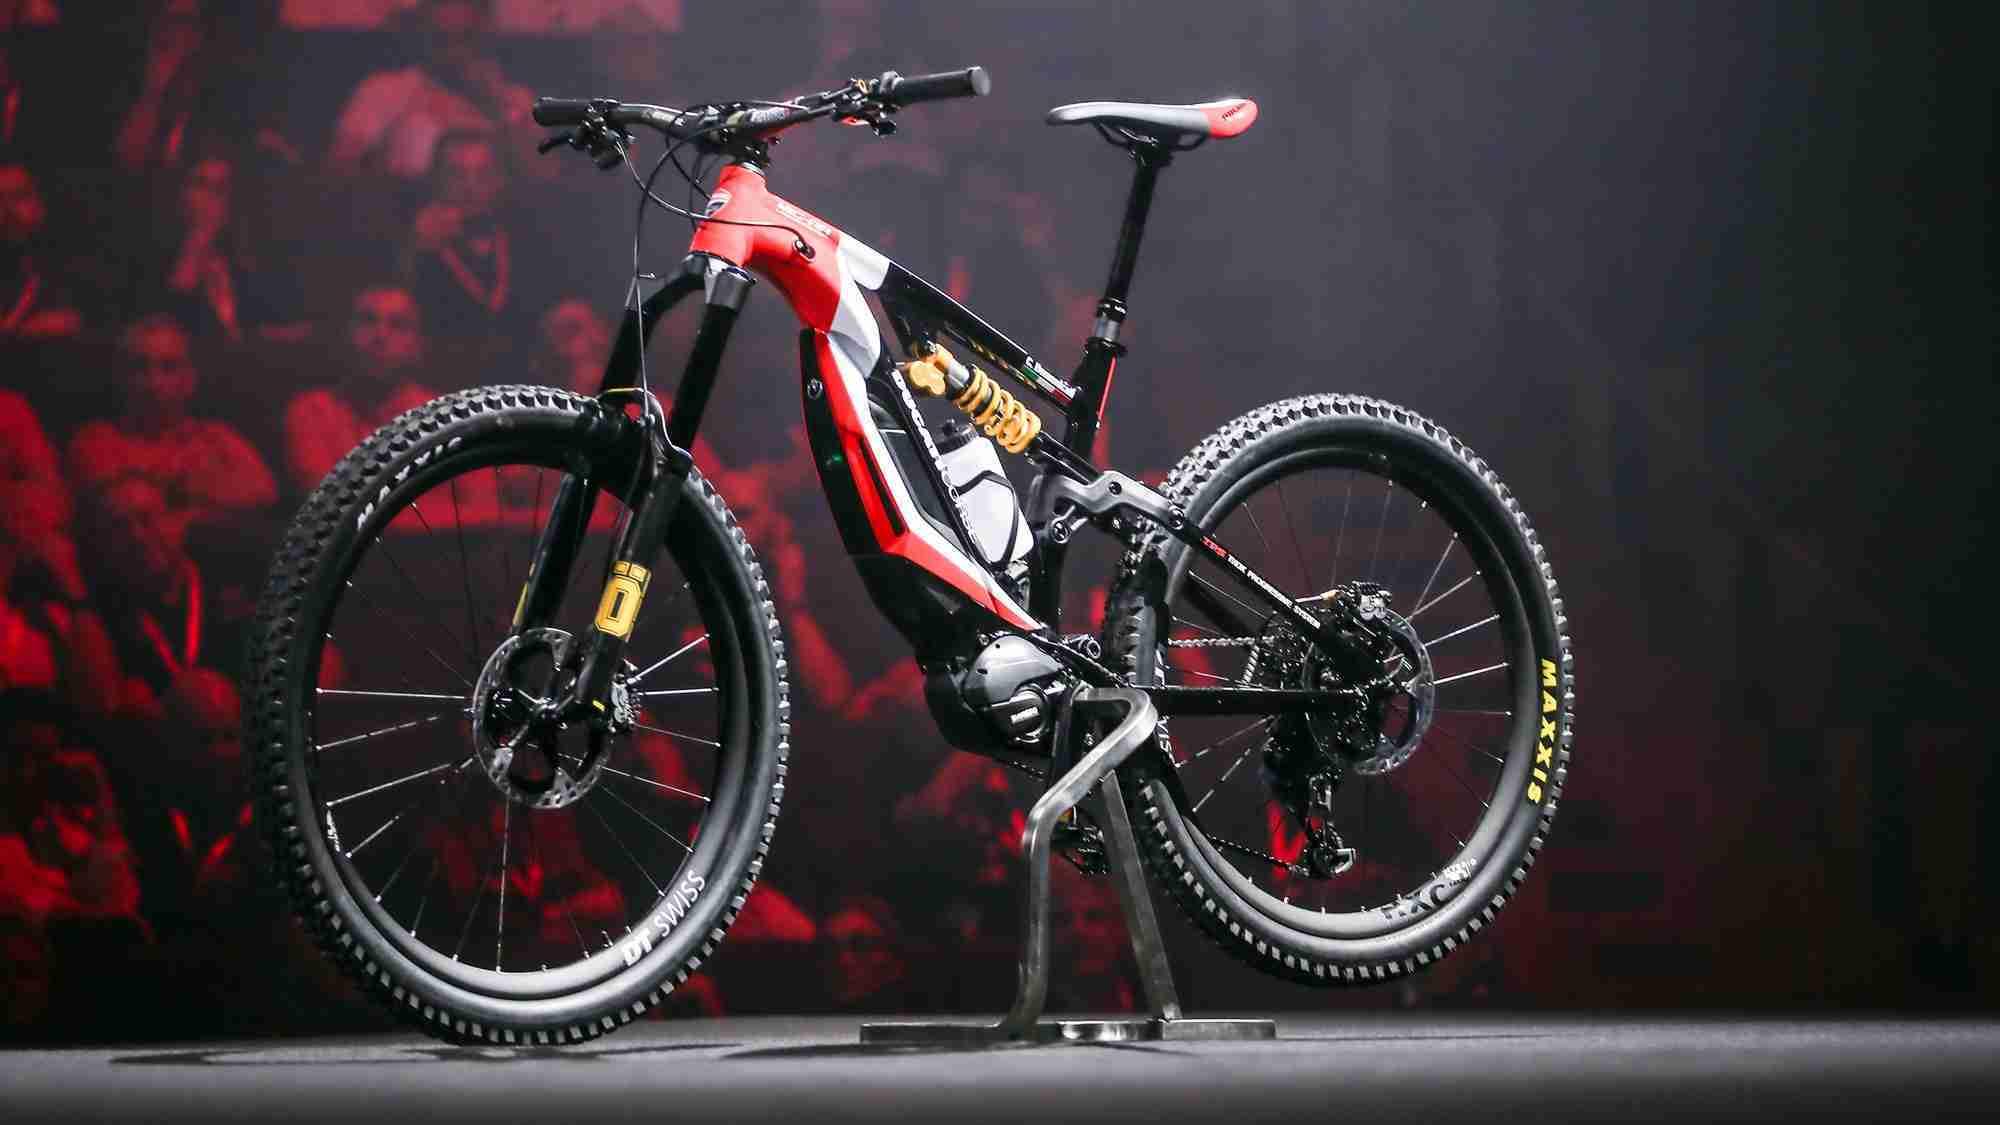 2020 Ducati Multistrada 1260 S Grand Tour HD wallpaper